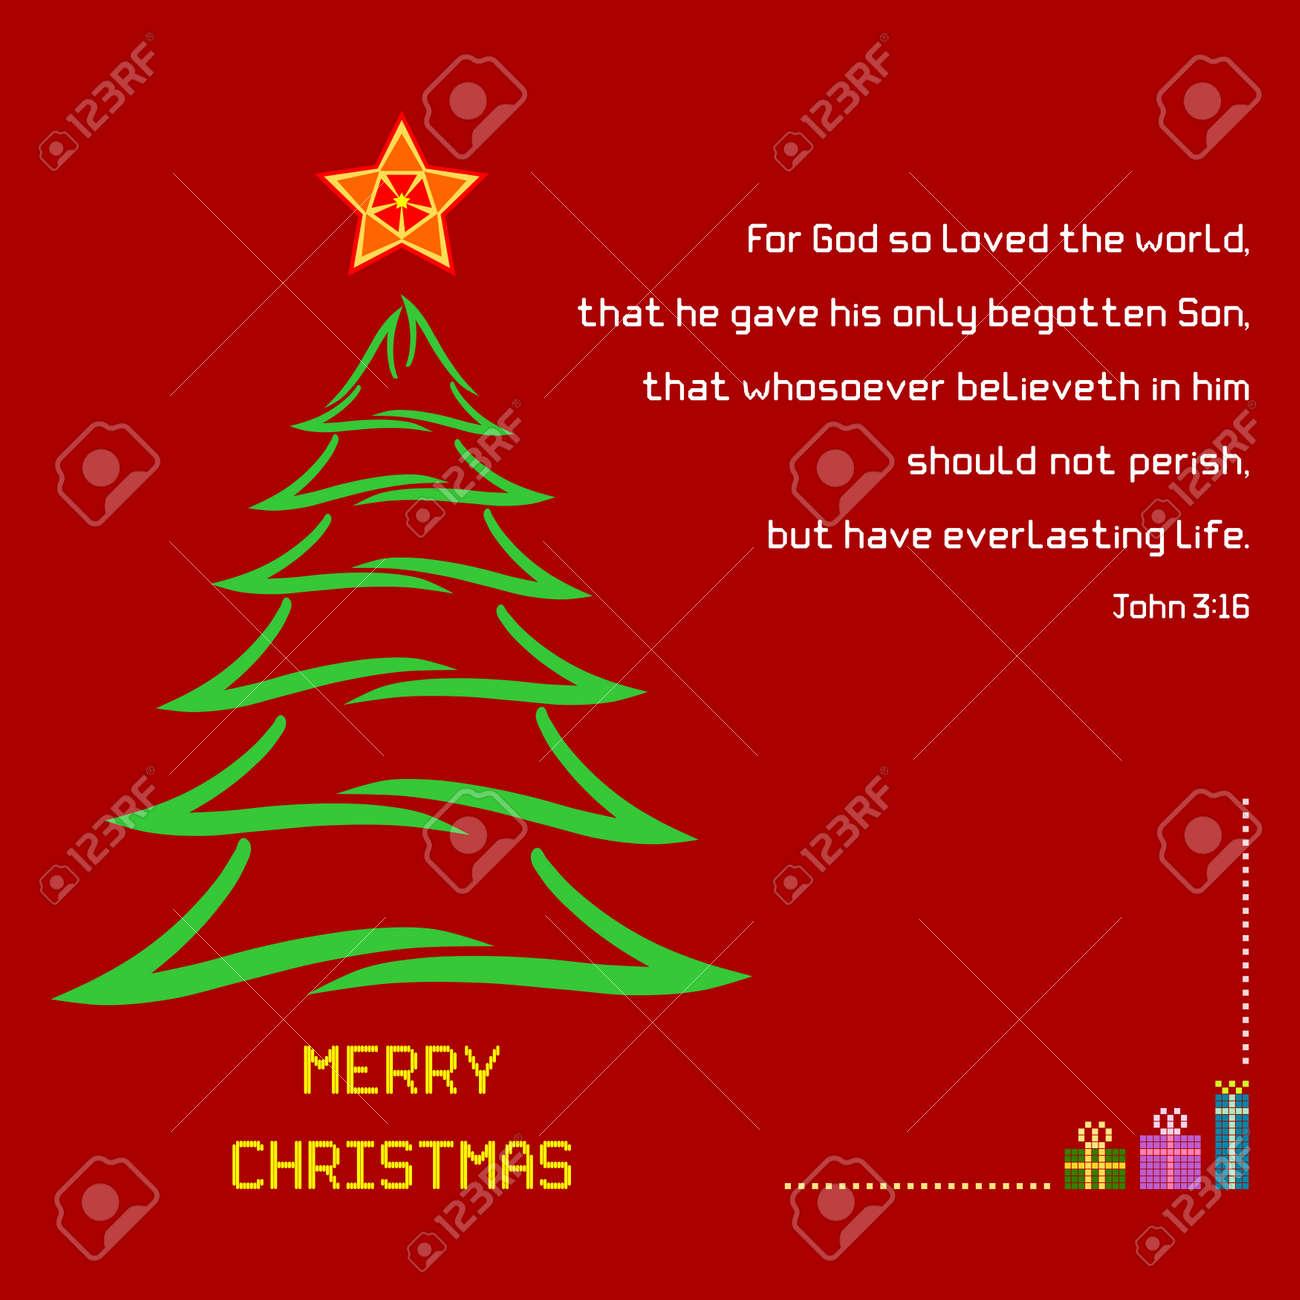 Christmas Holy Bible Verse John 316 A Christmas Greeting With